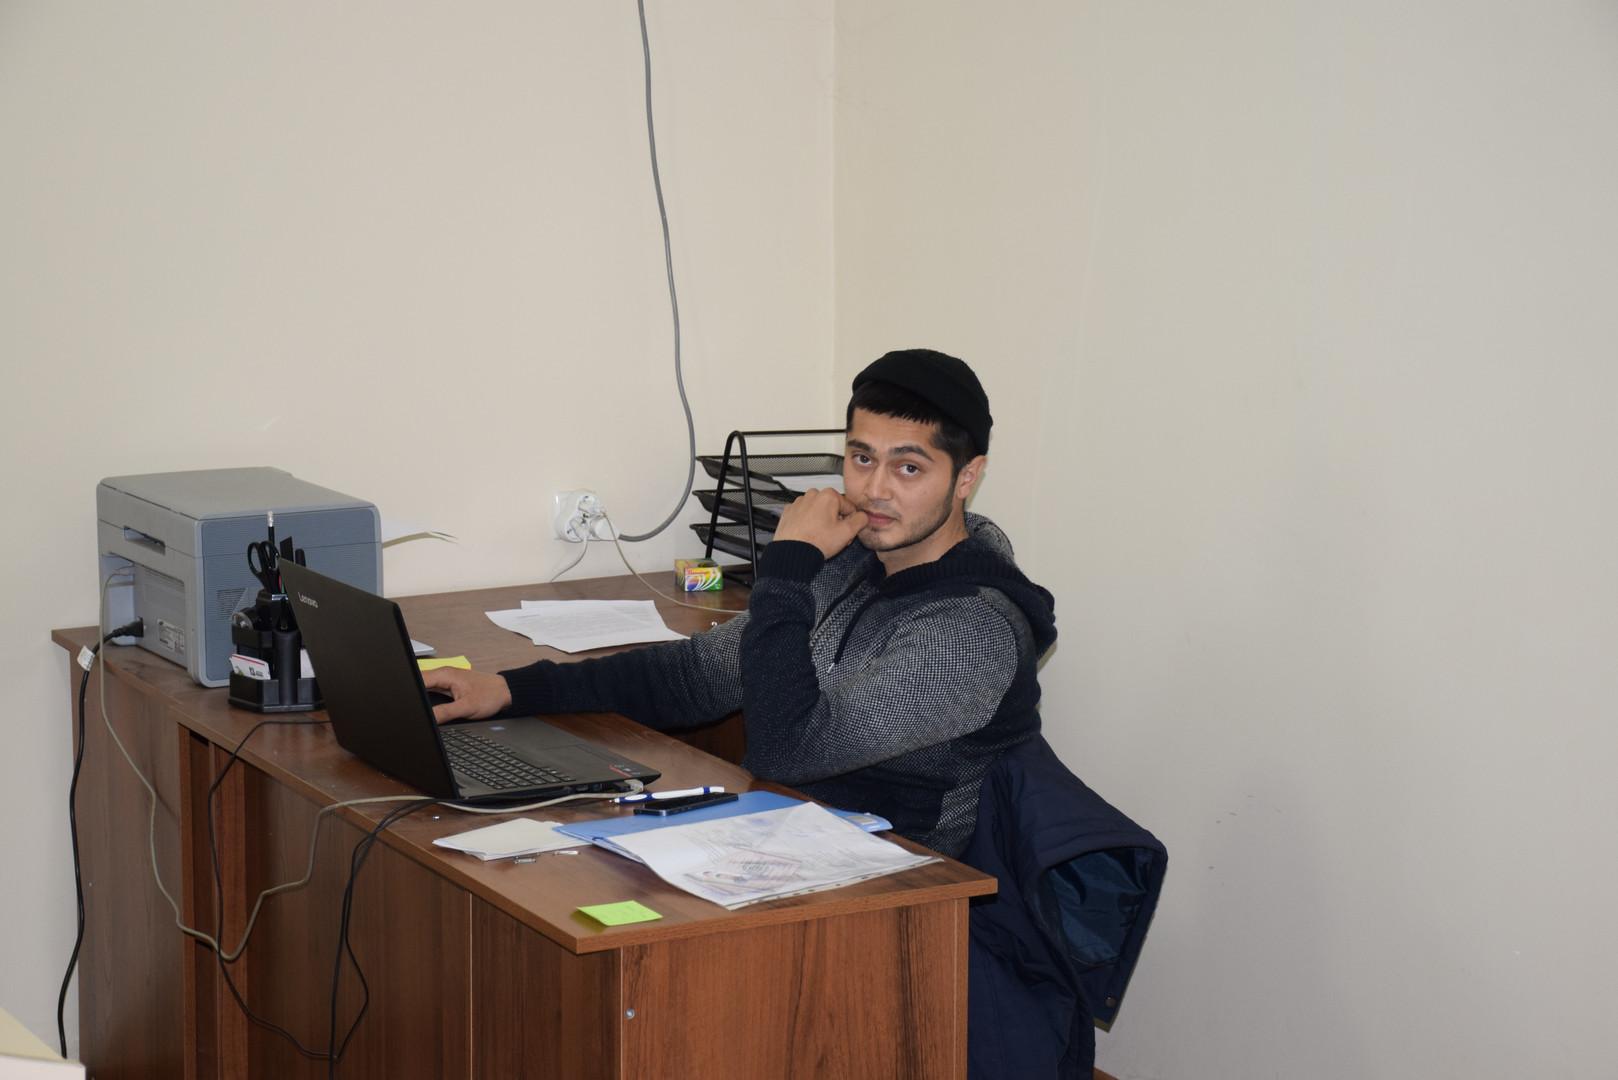 Sardor @ work